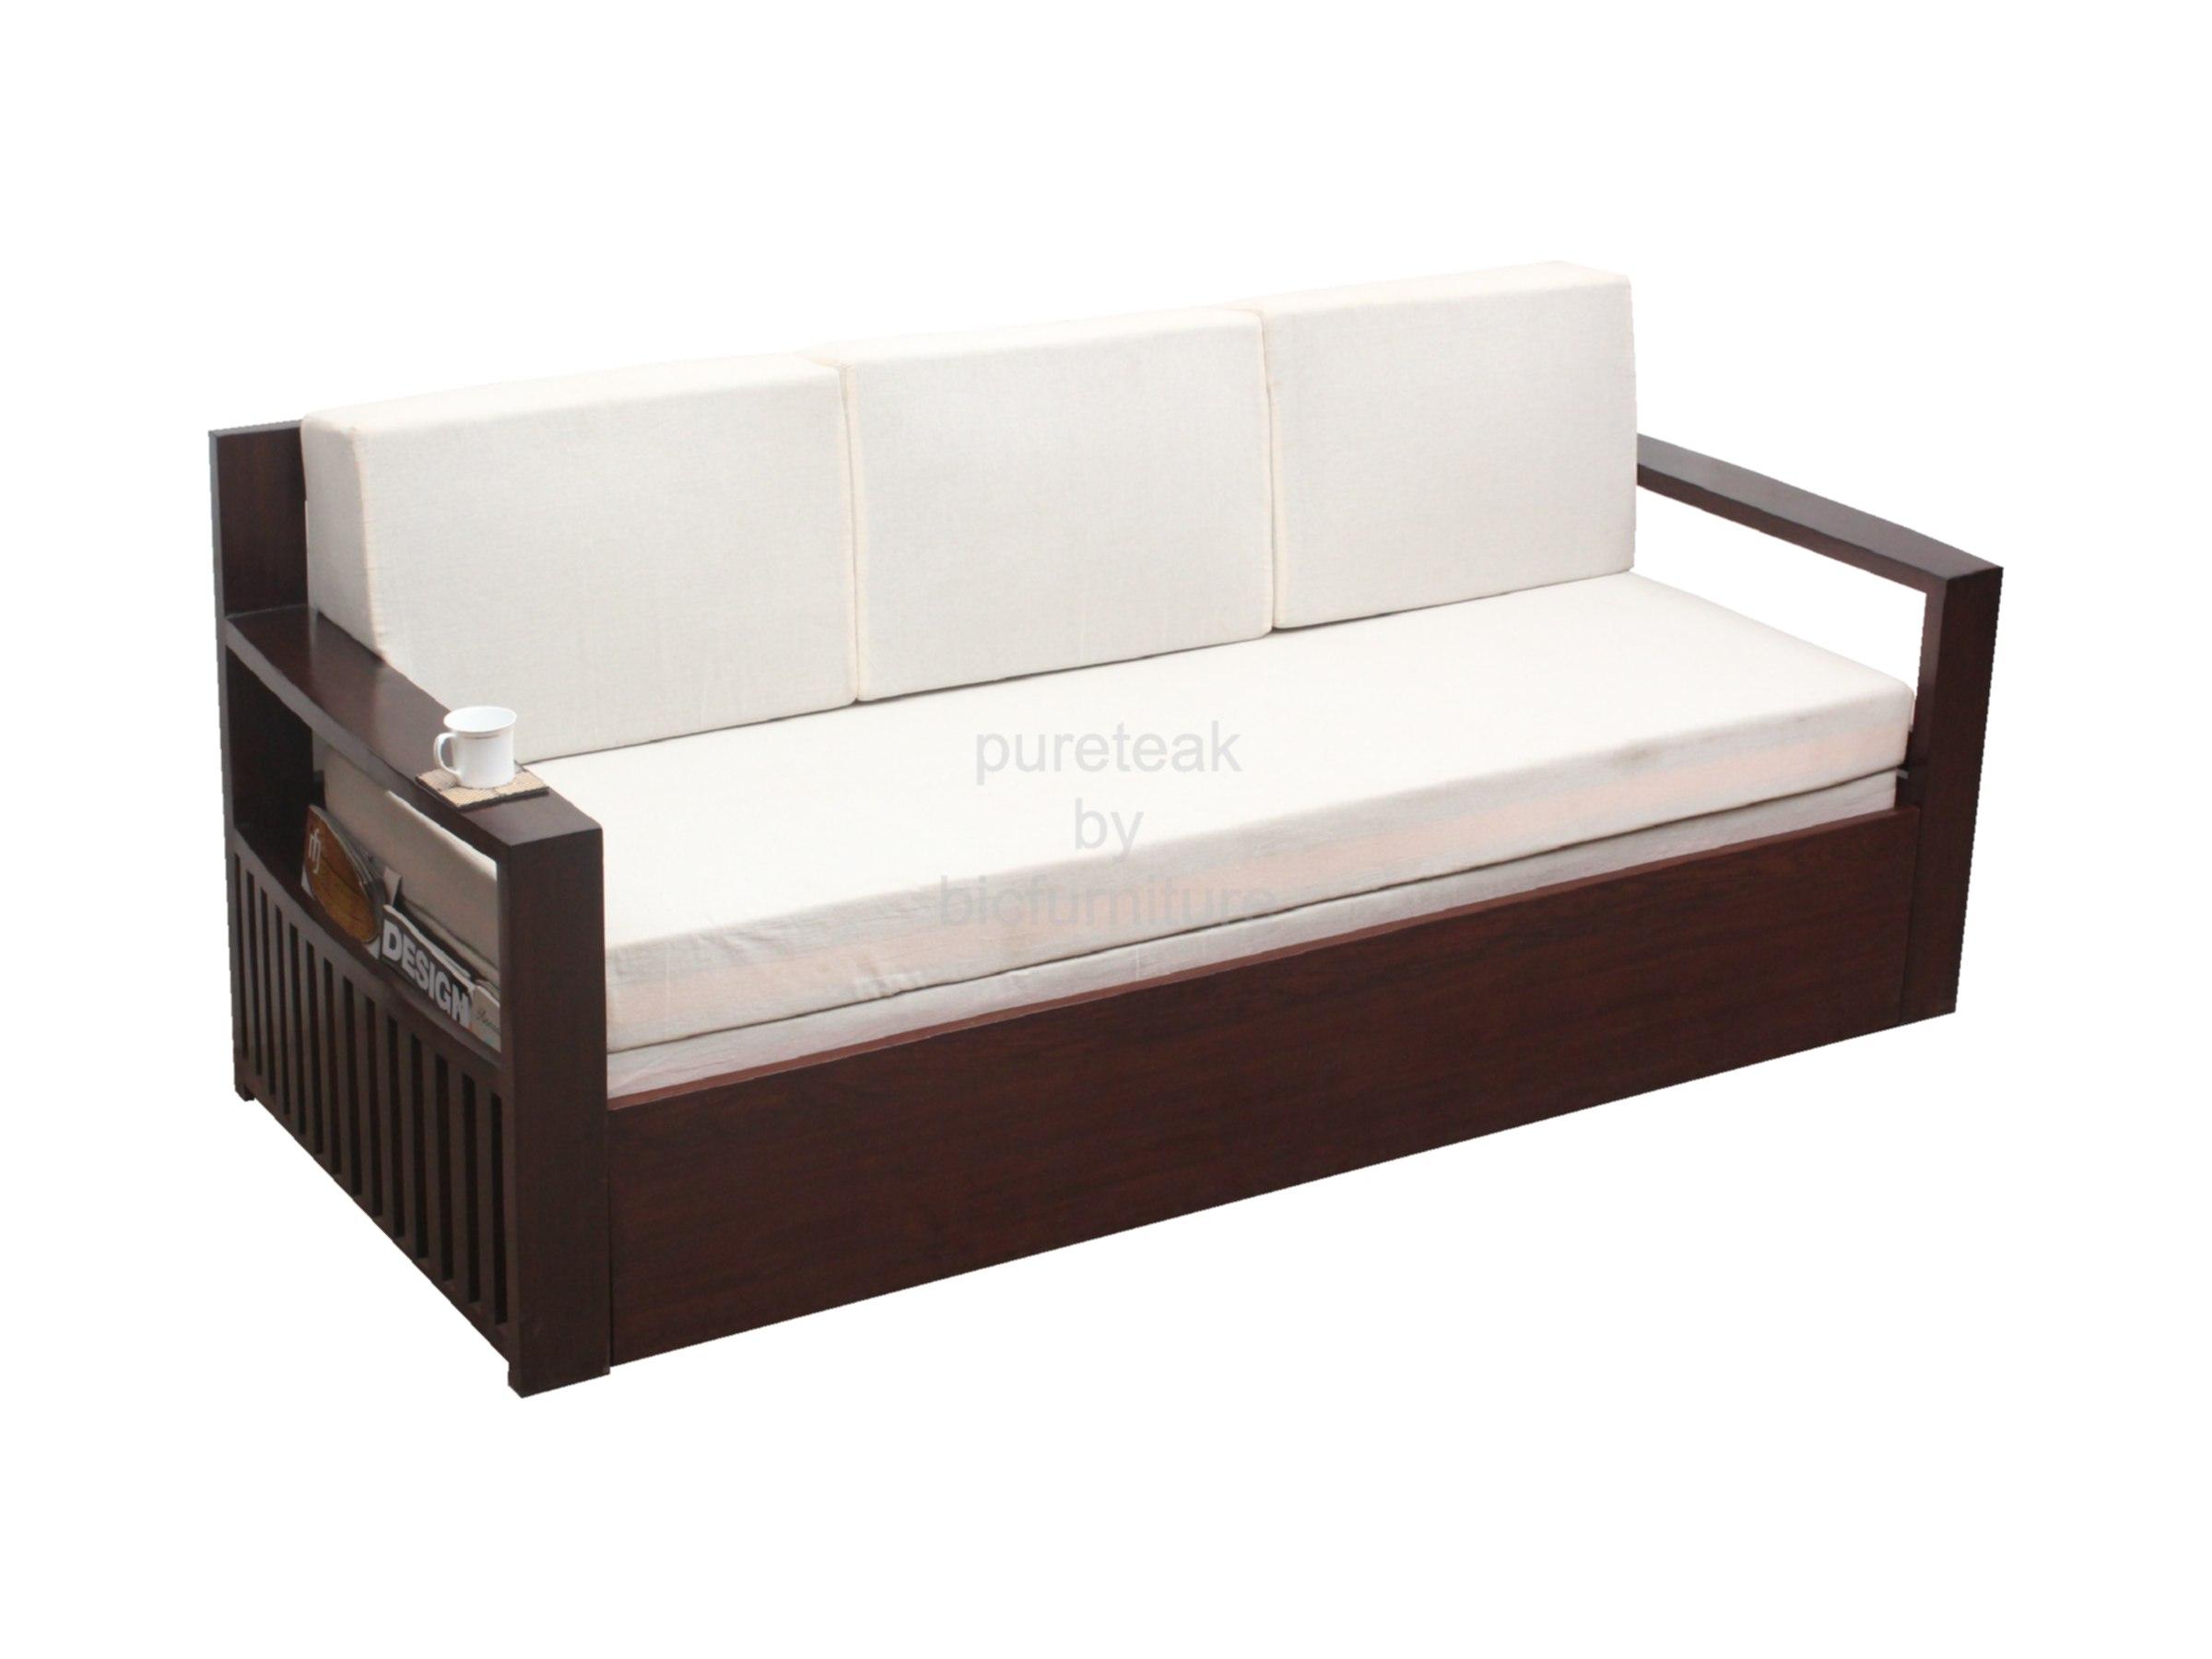 Teak wood sofa cum bed with storage SFB 12 Details